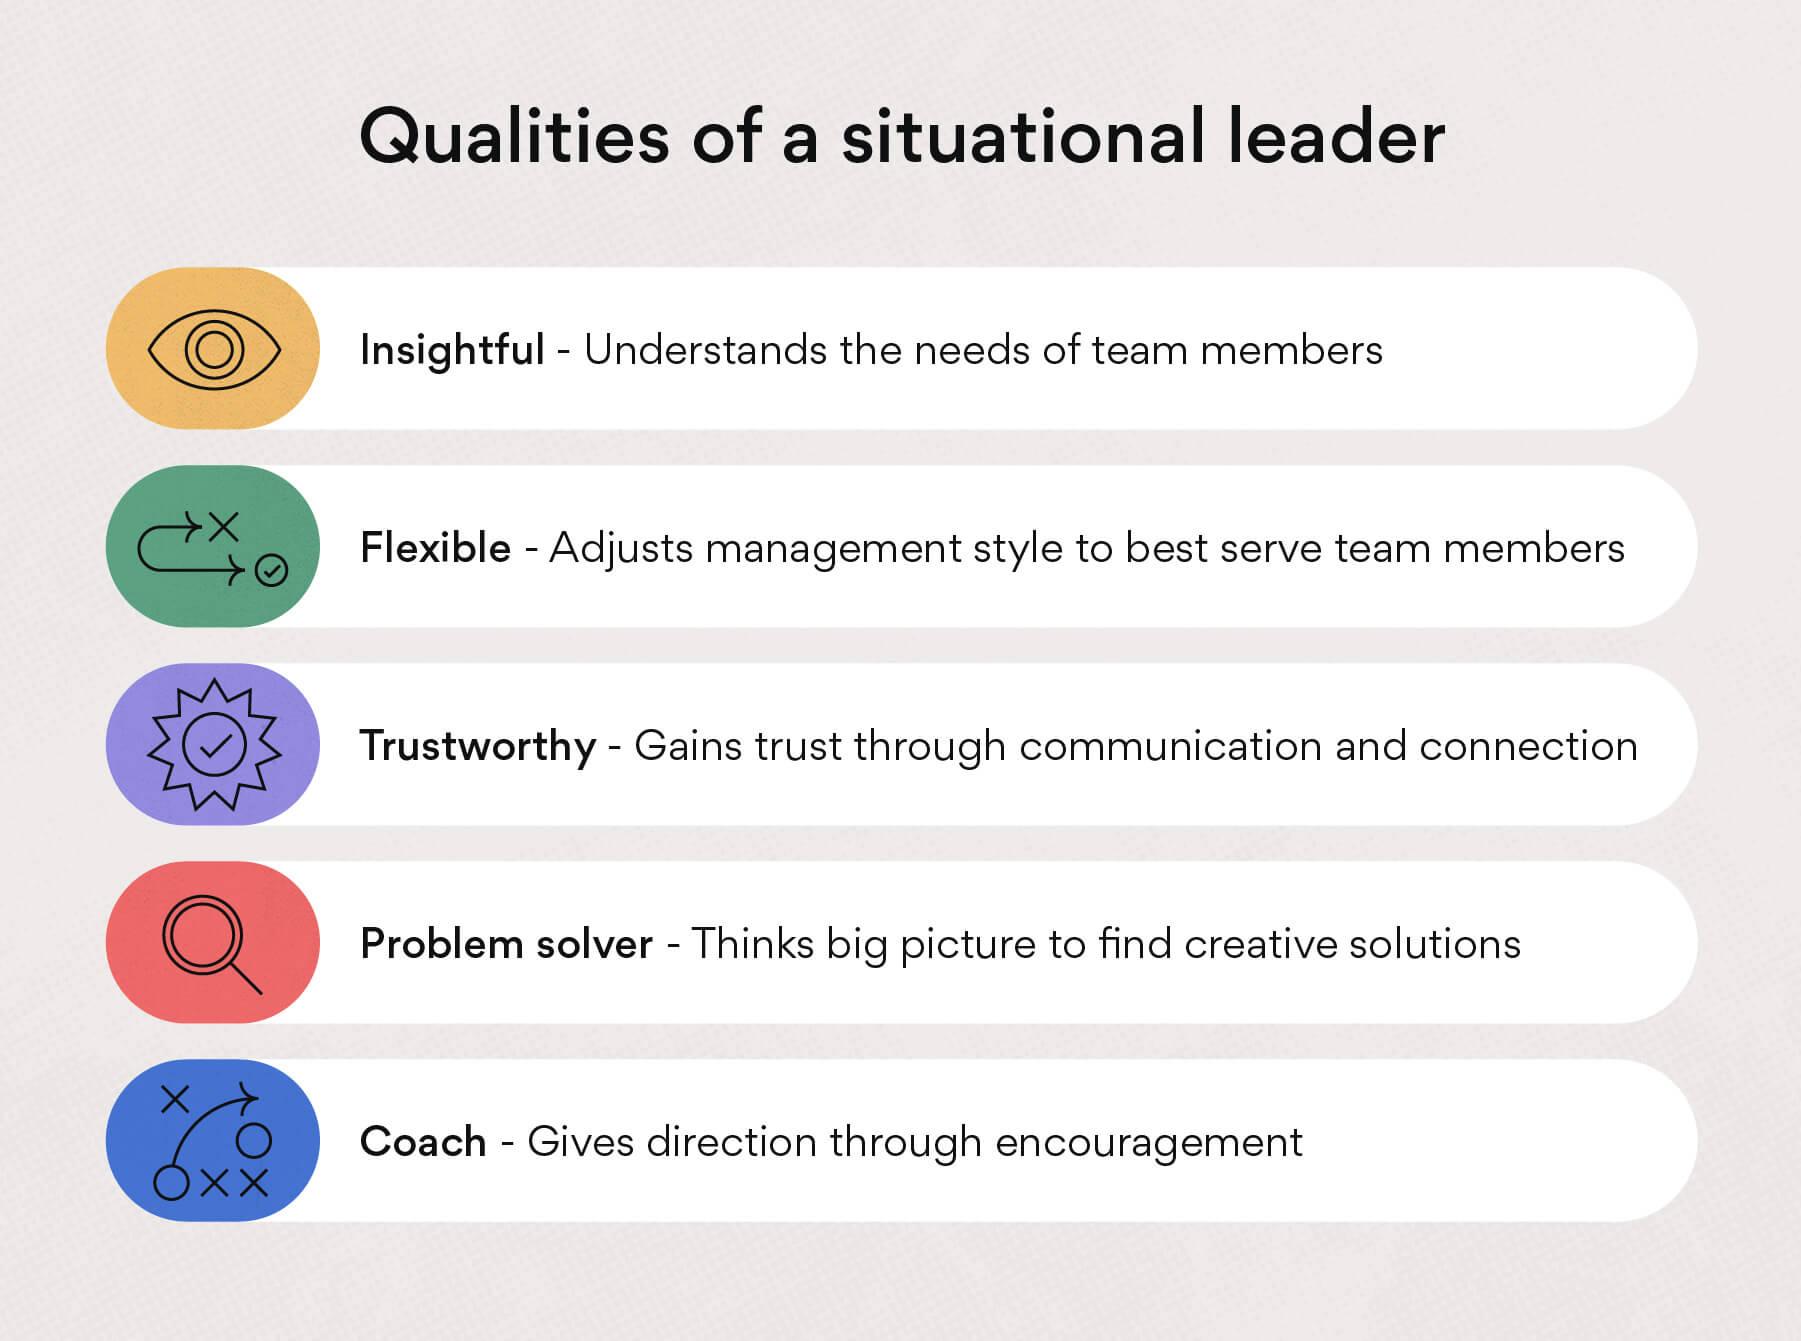 Situational leadership qualities